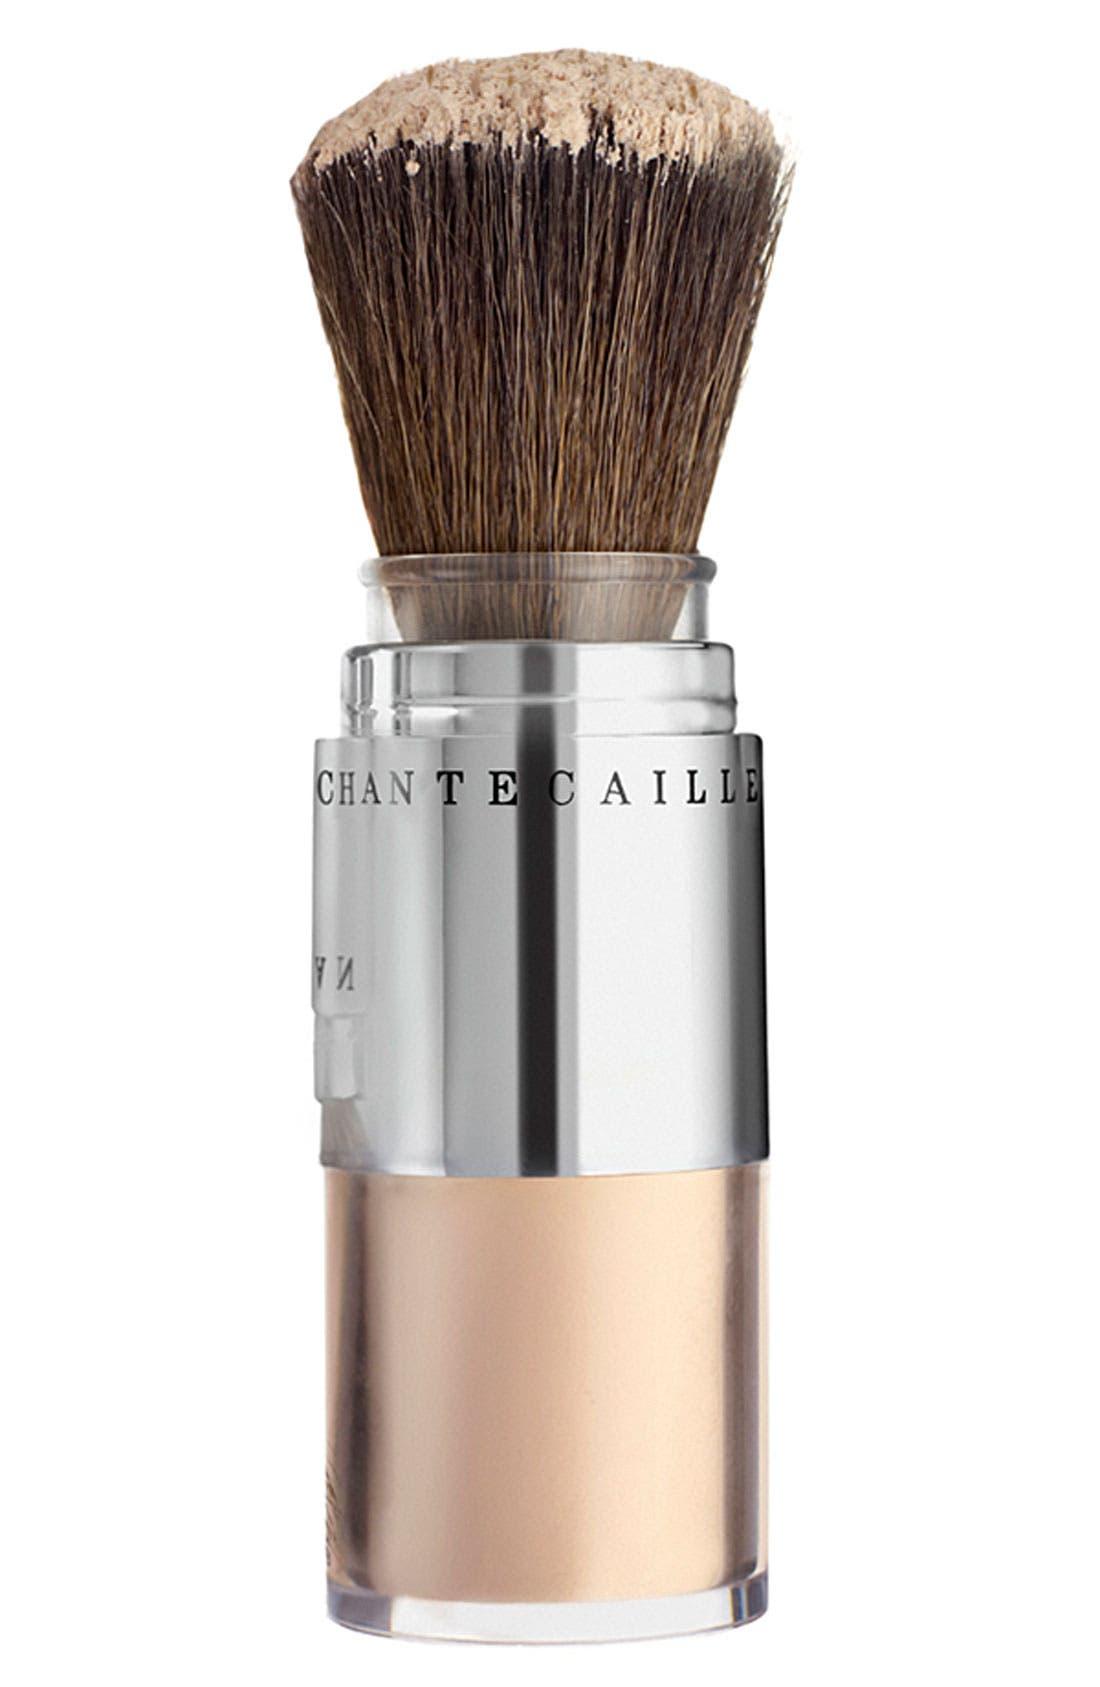 CHANTECAILLE 'Protection Naturelle' Loose Powder, Main, color, 001